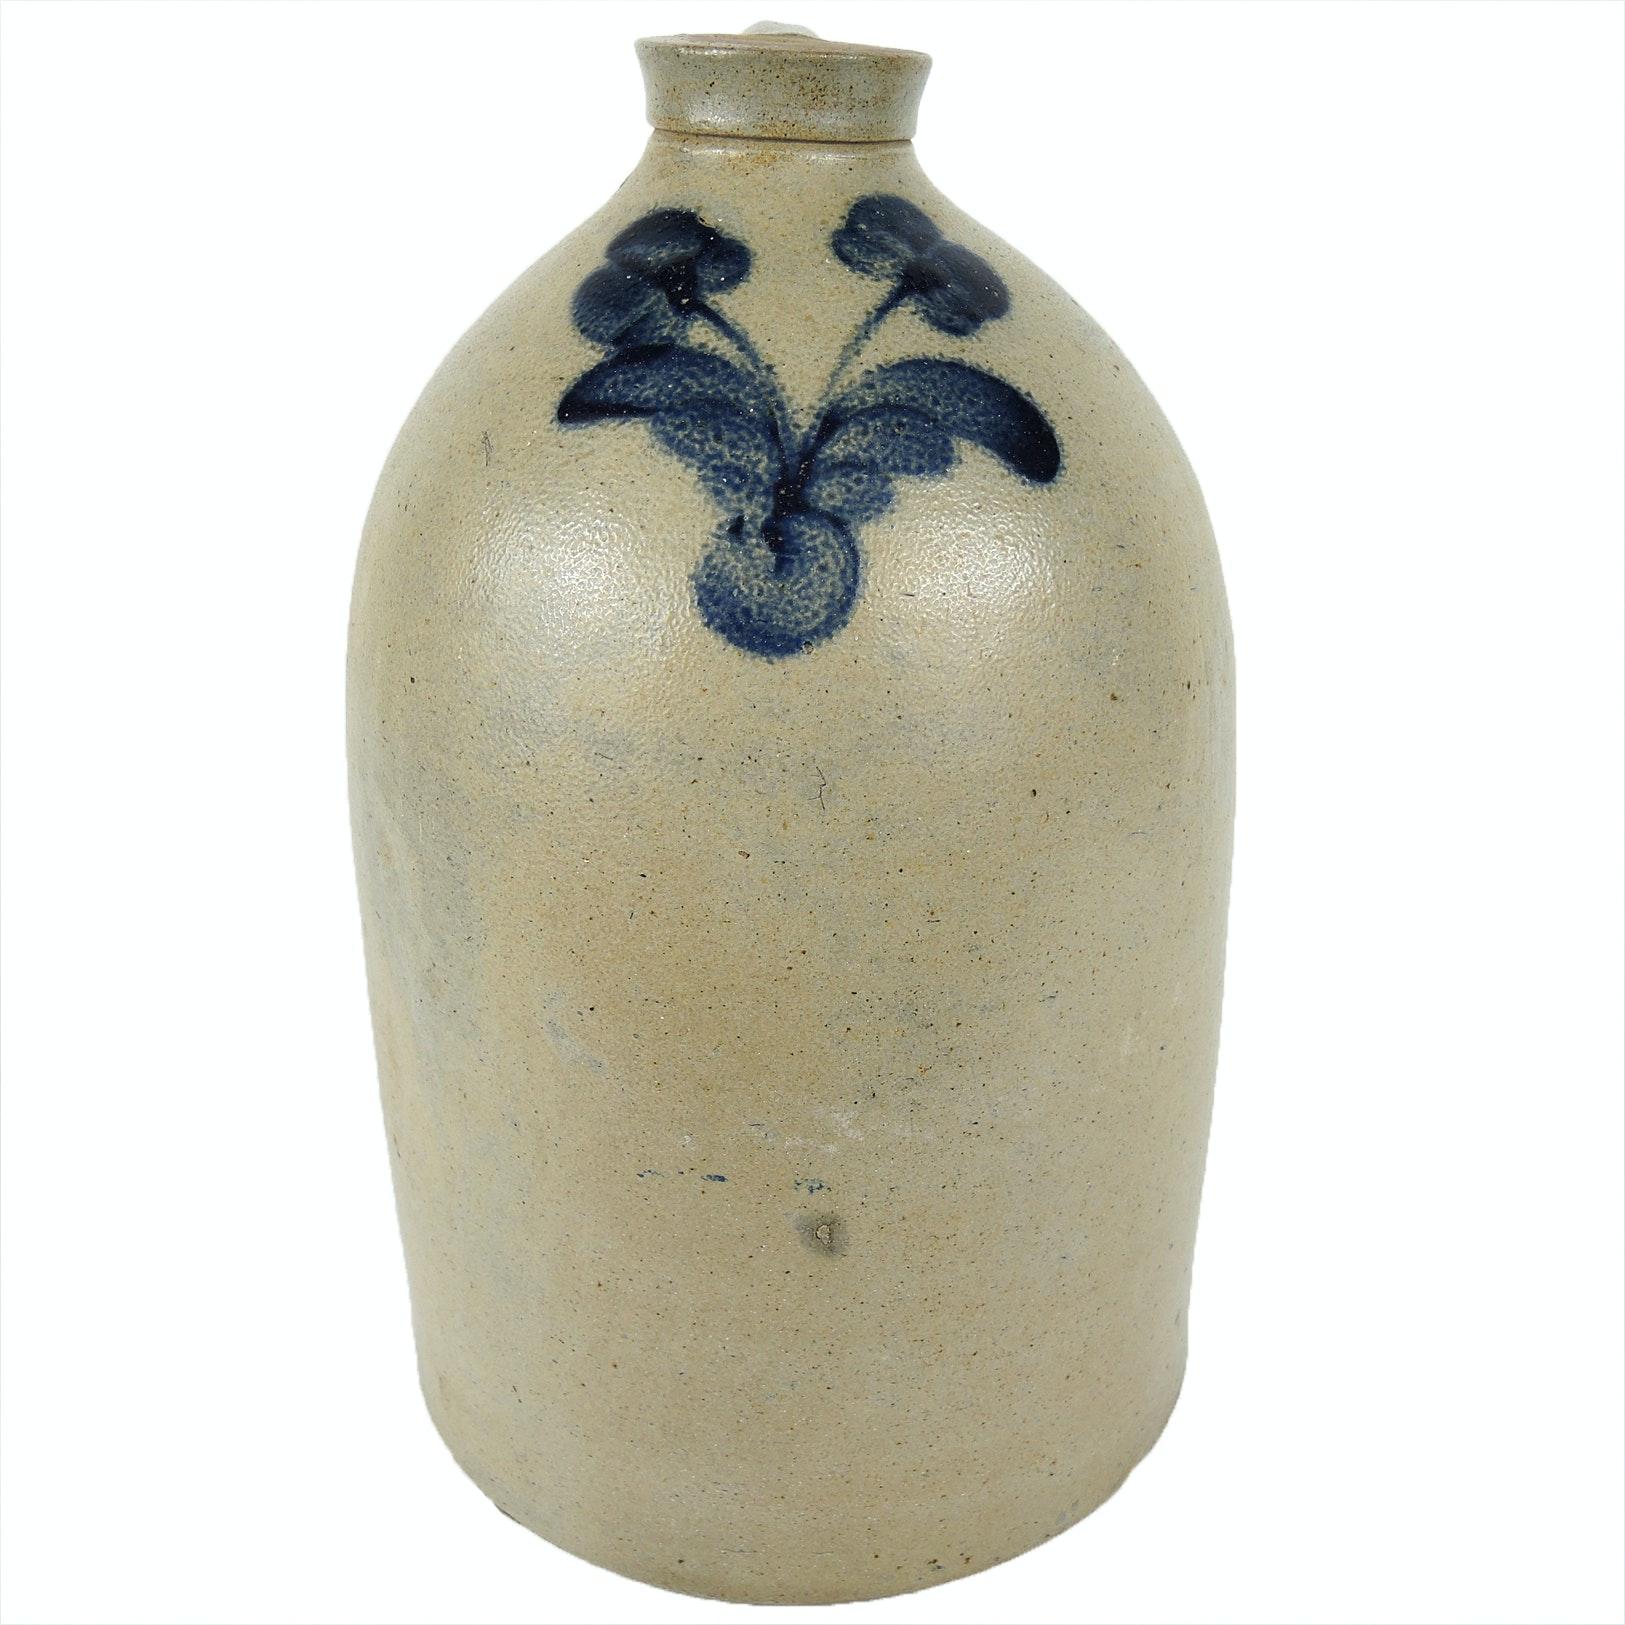 Salt Glazed Stoneware Jug with Cobalt Decoration